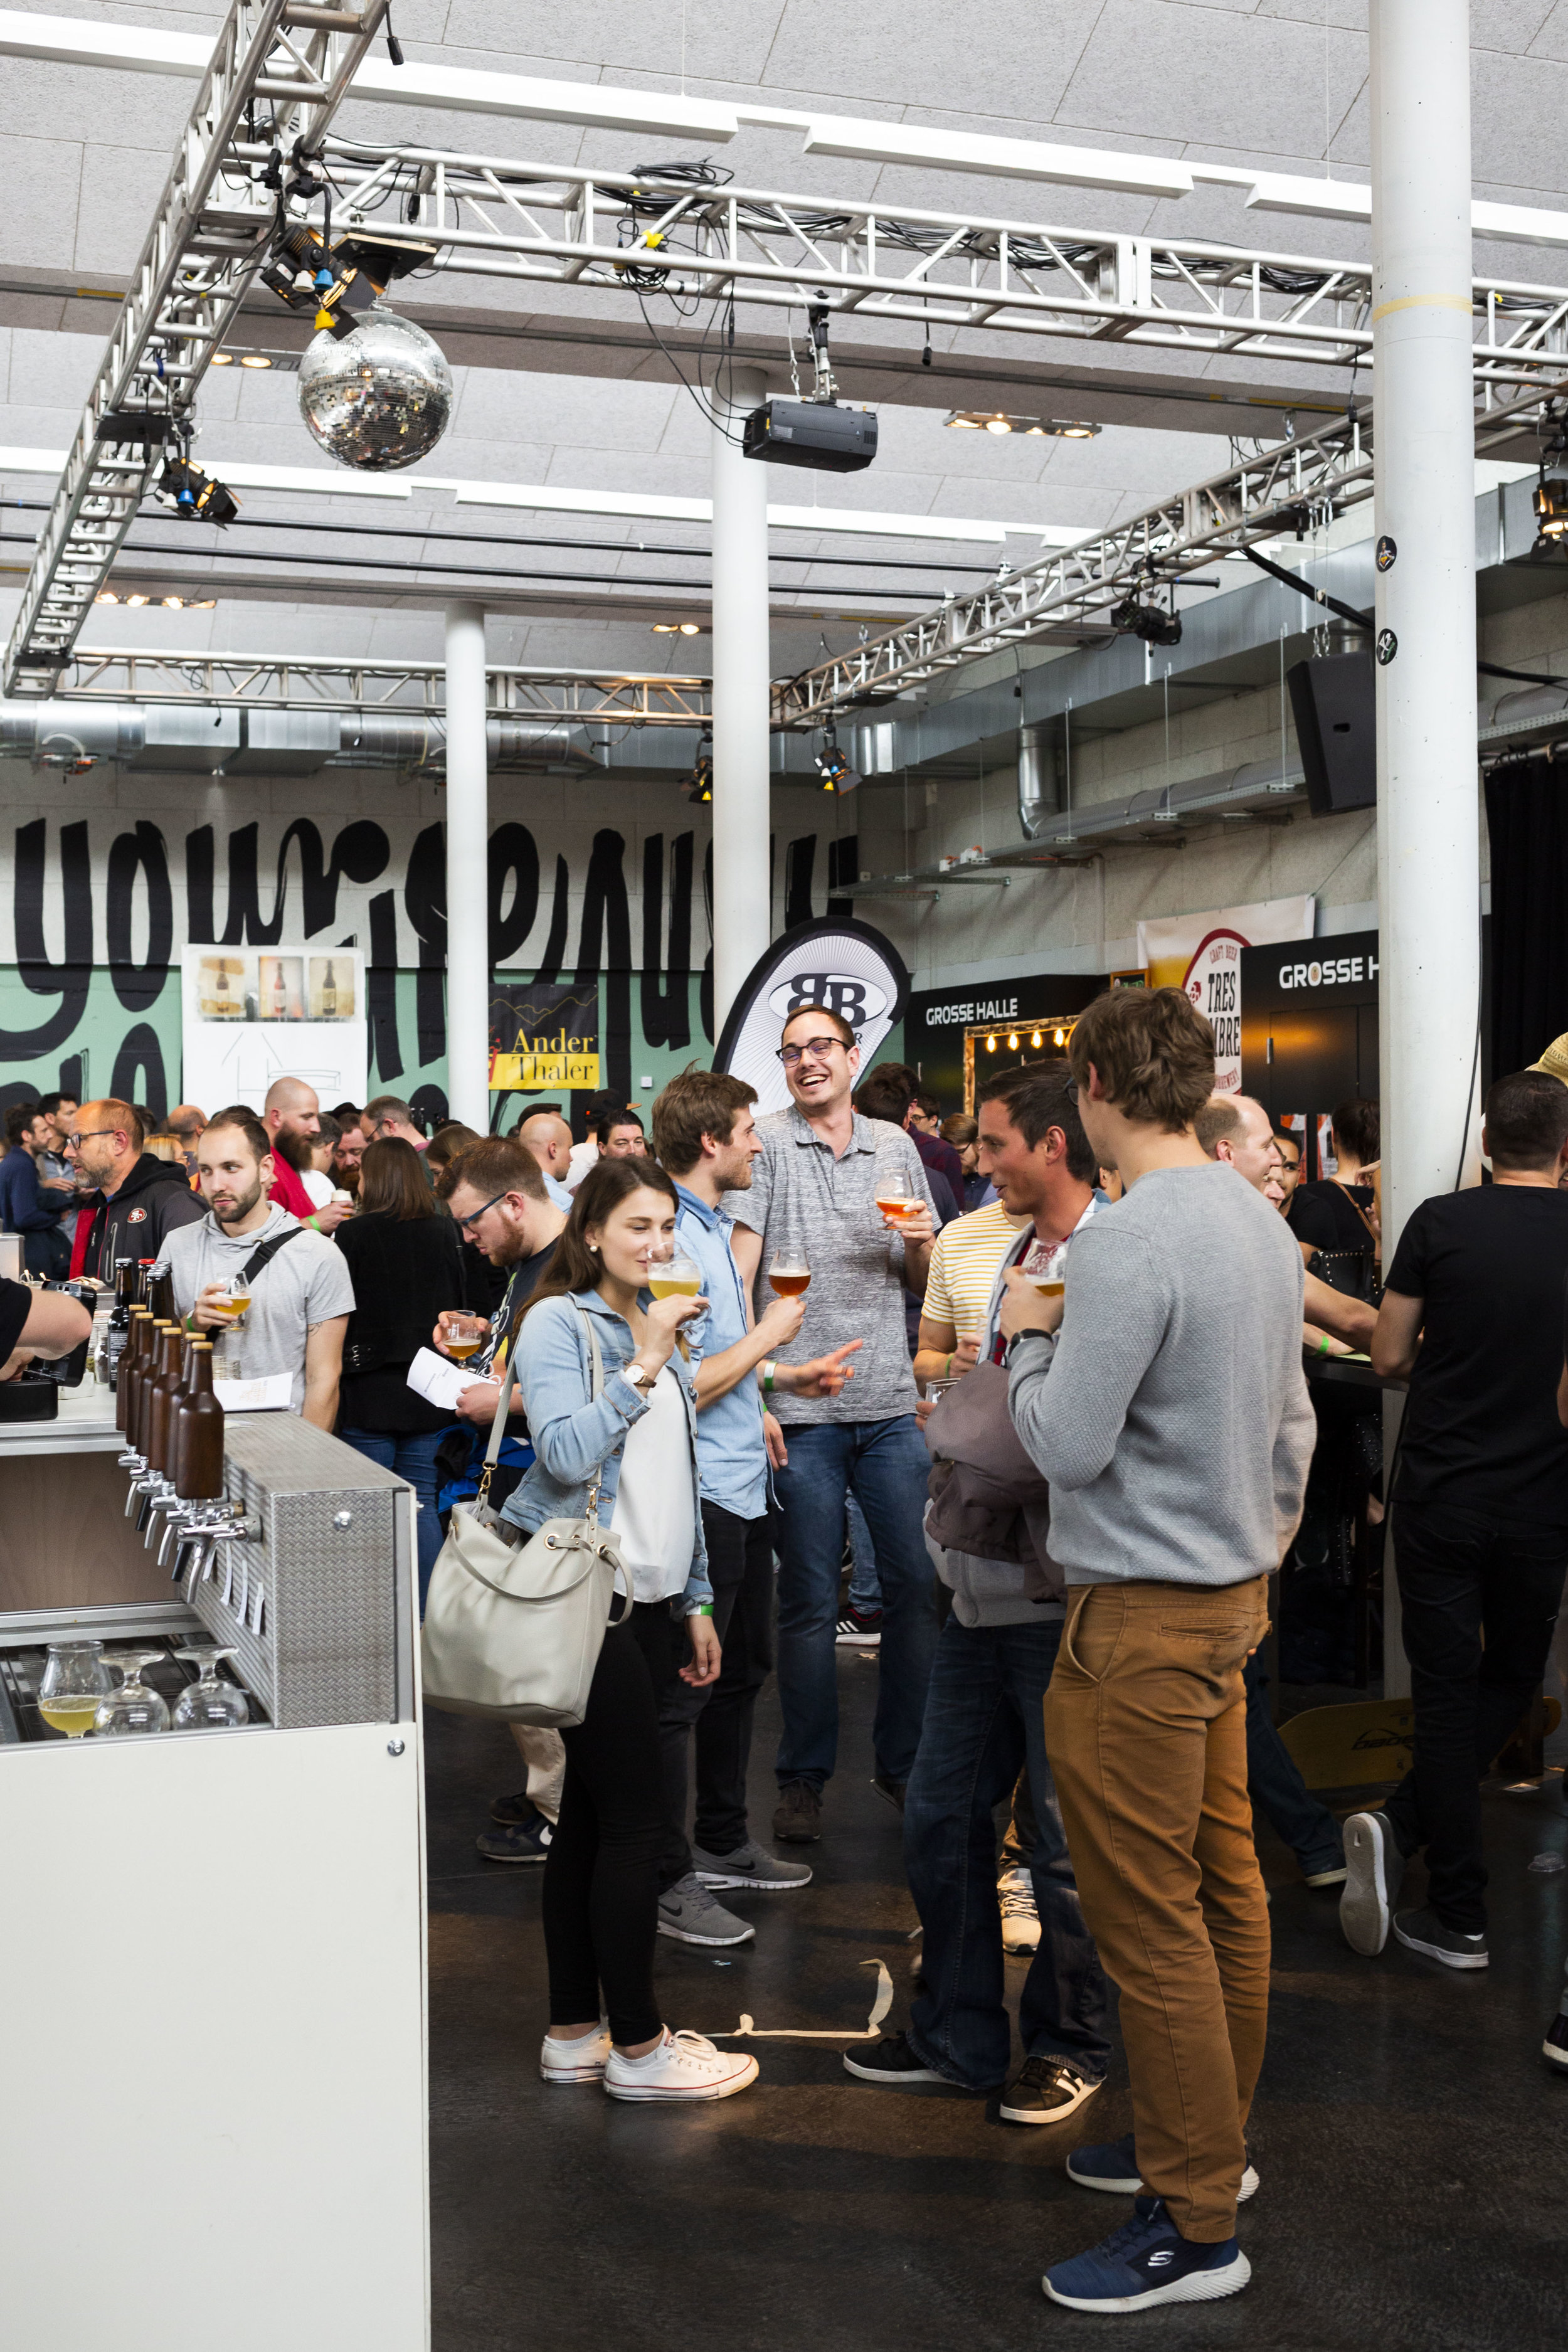 BierfestivalLuzern-36.jpg